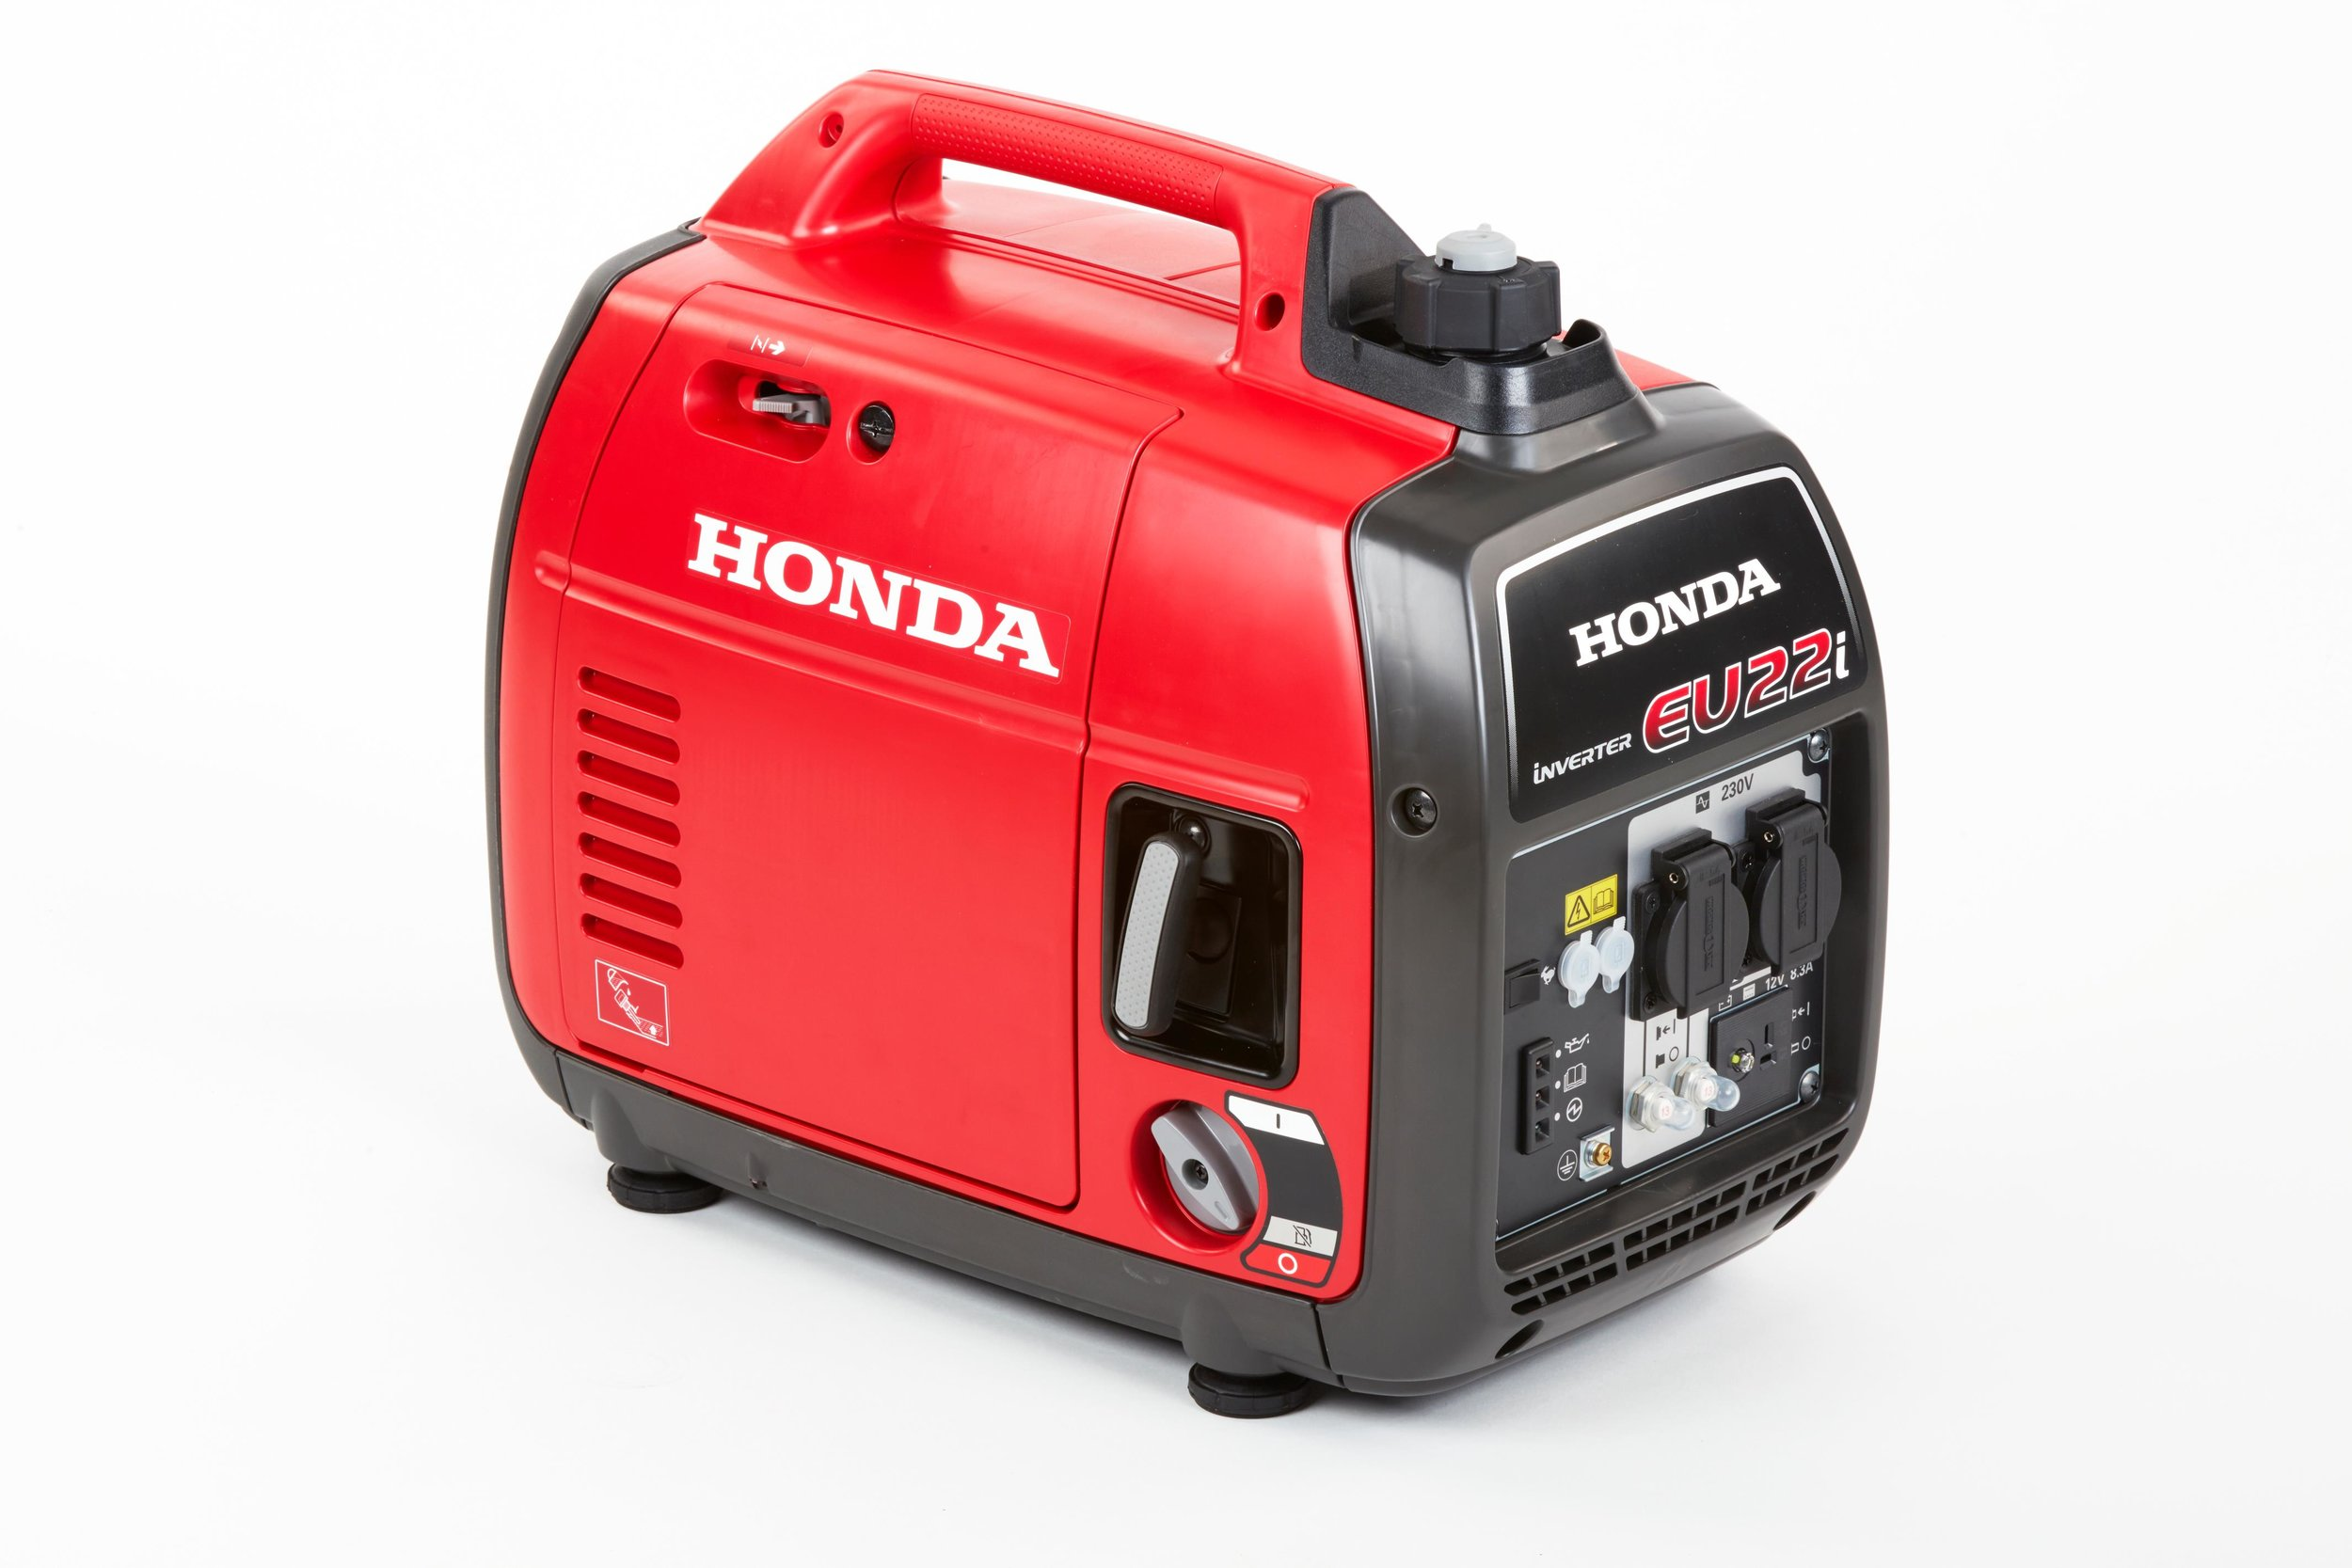 Honda EU22.jpg